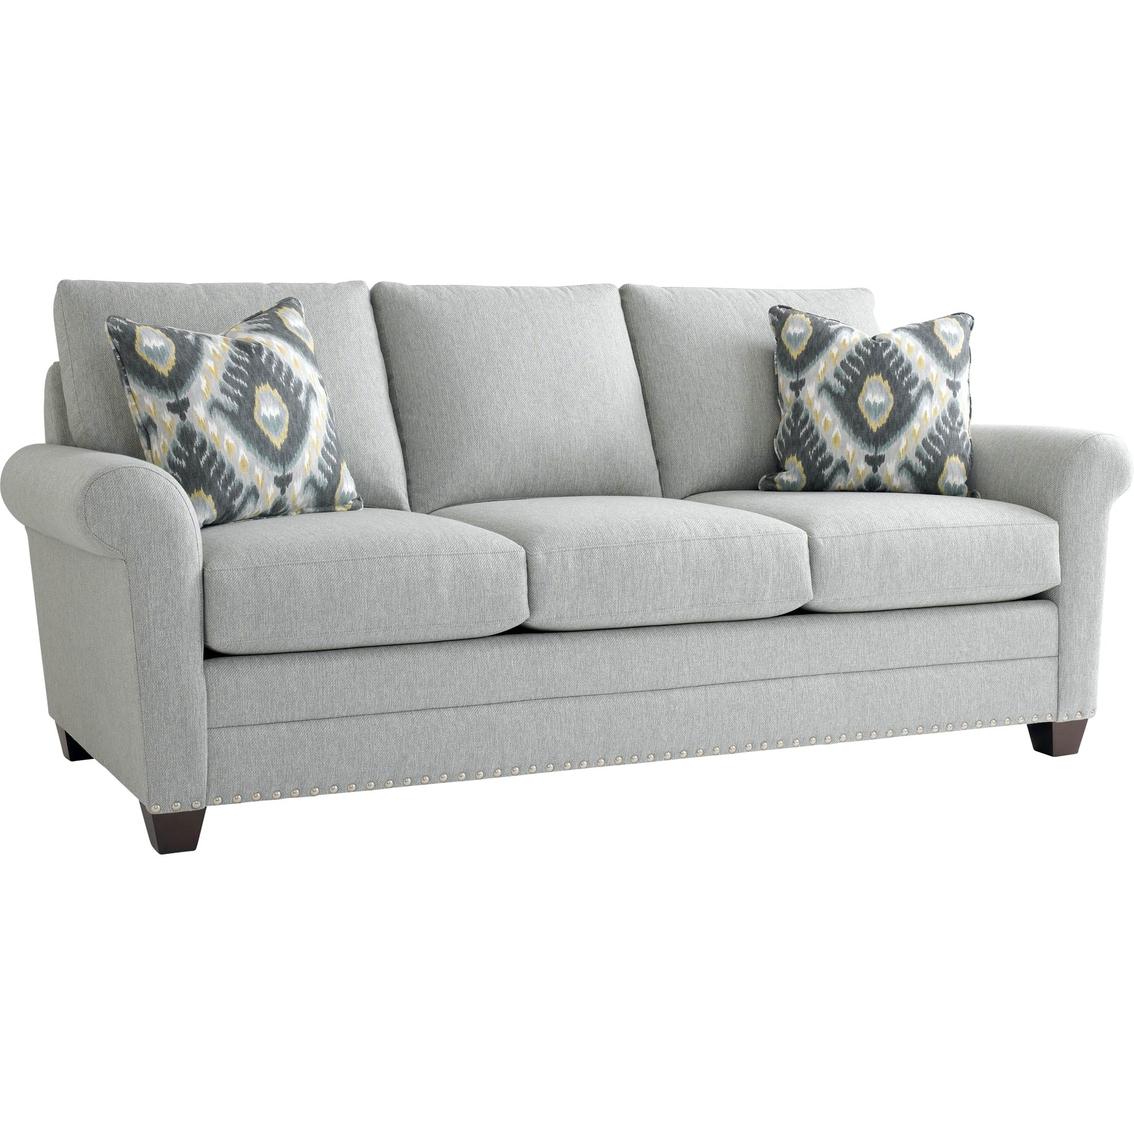 Bassett Anderson Sofa